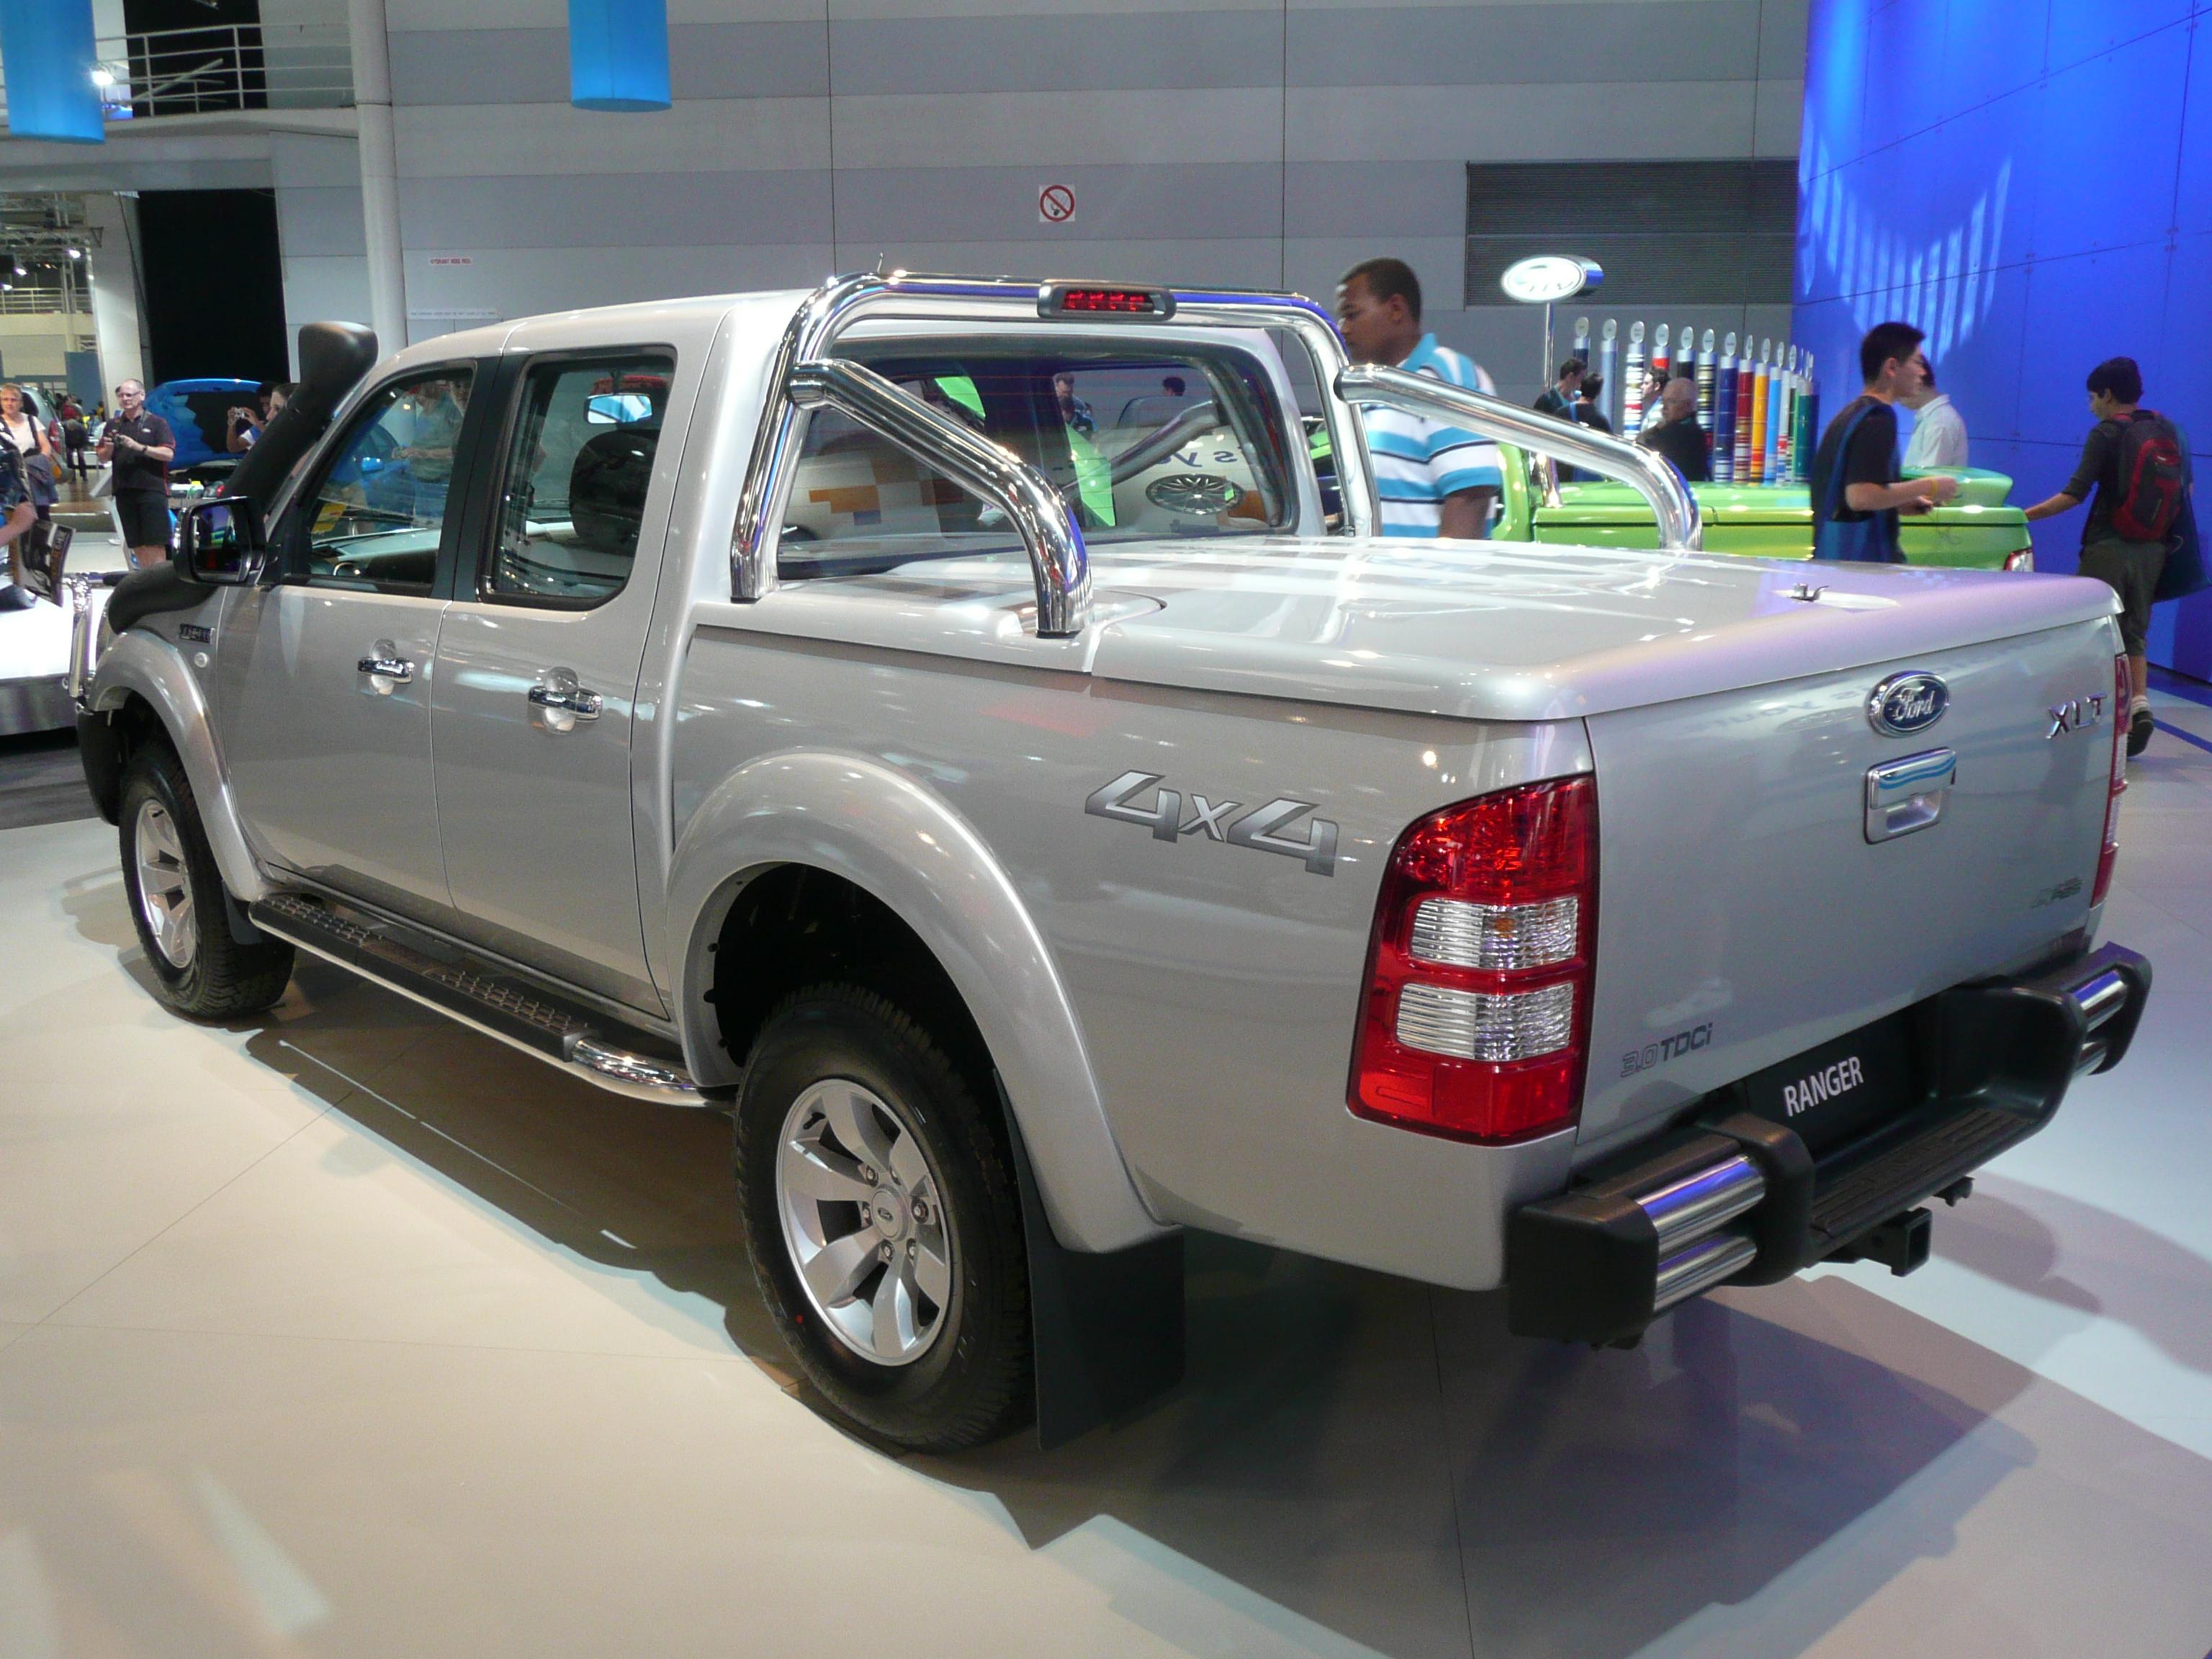 Image Result For Ford Edge Xlt